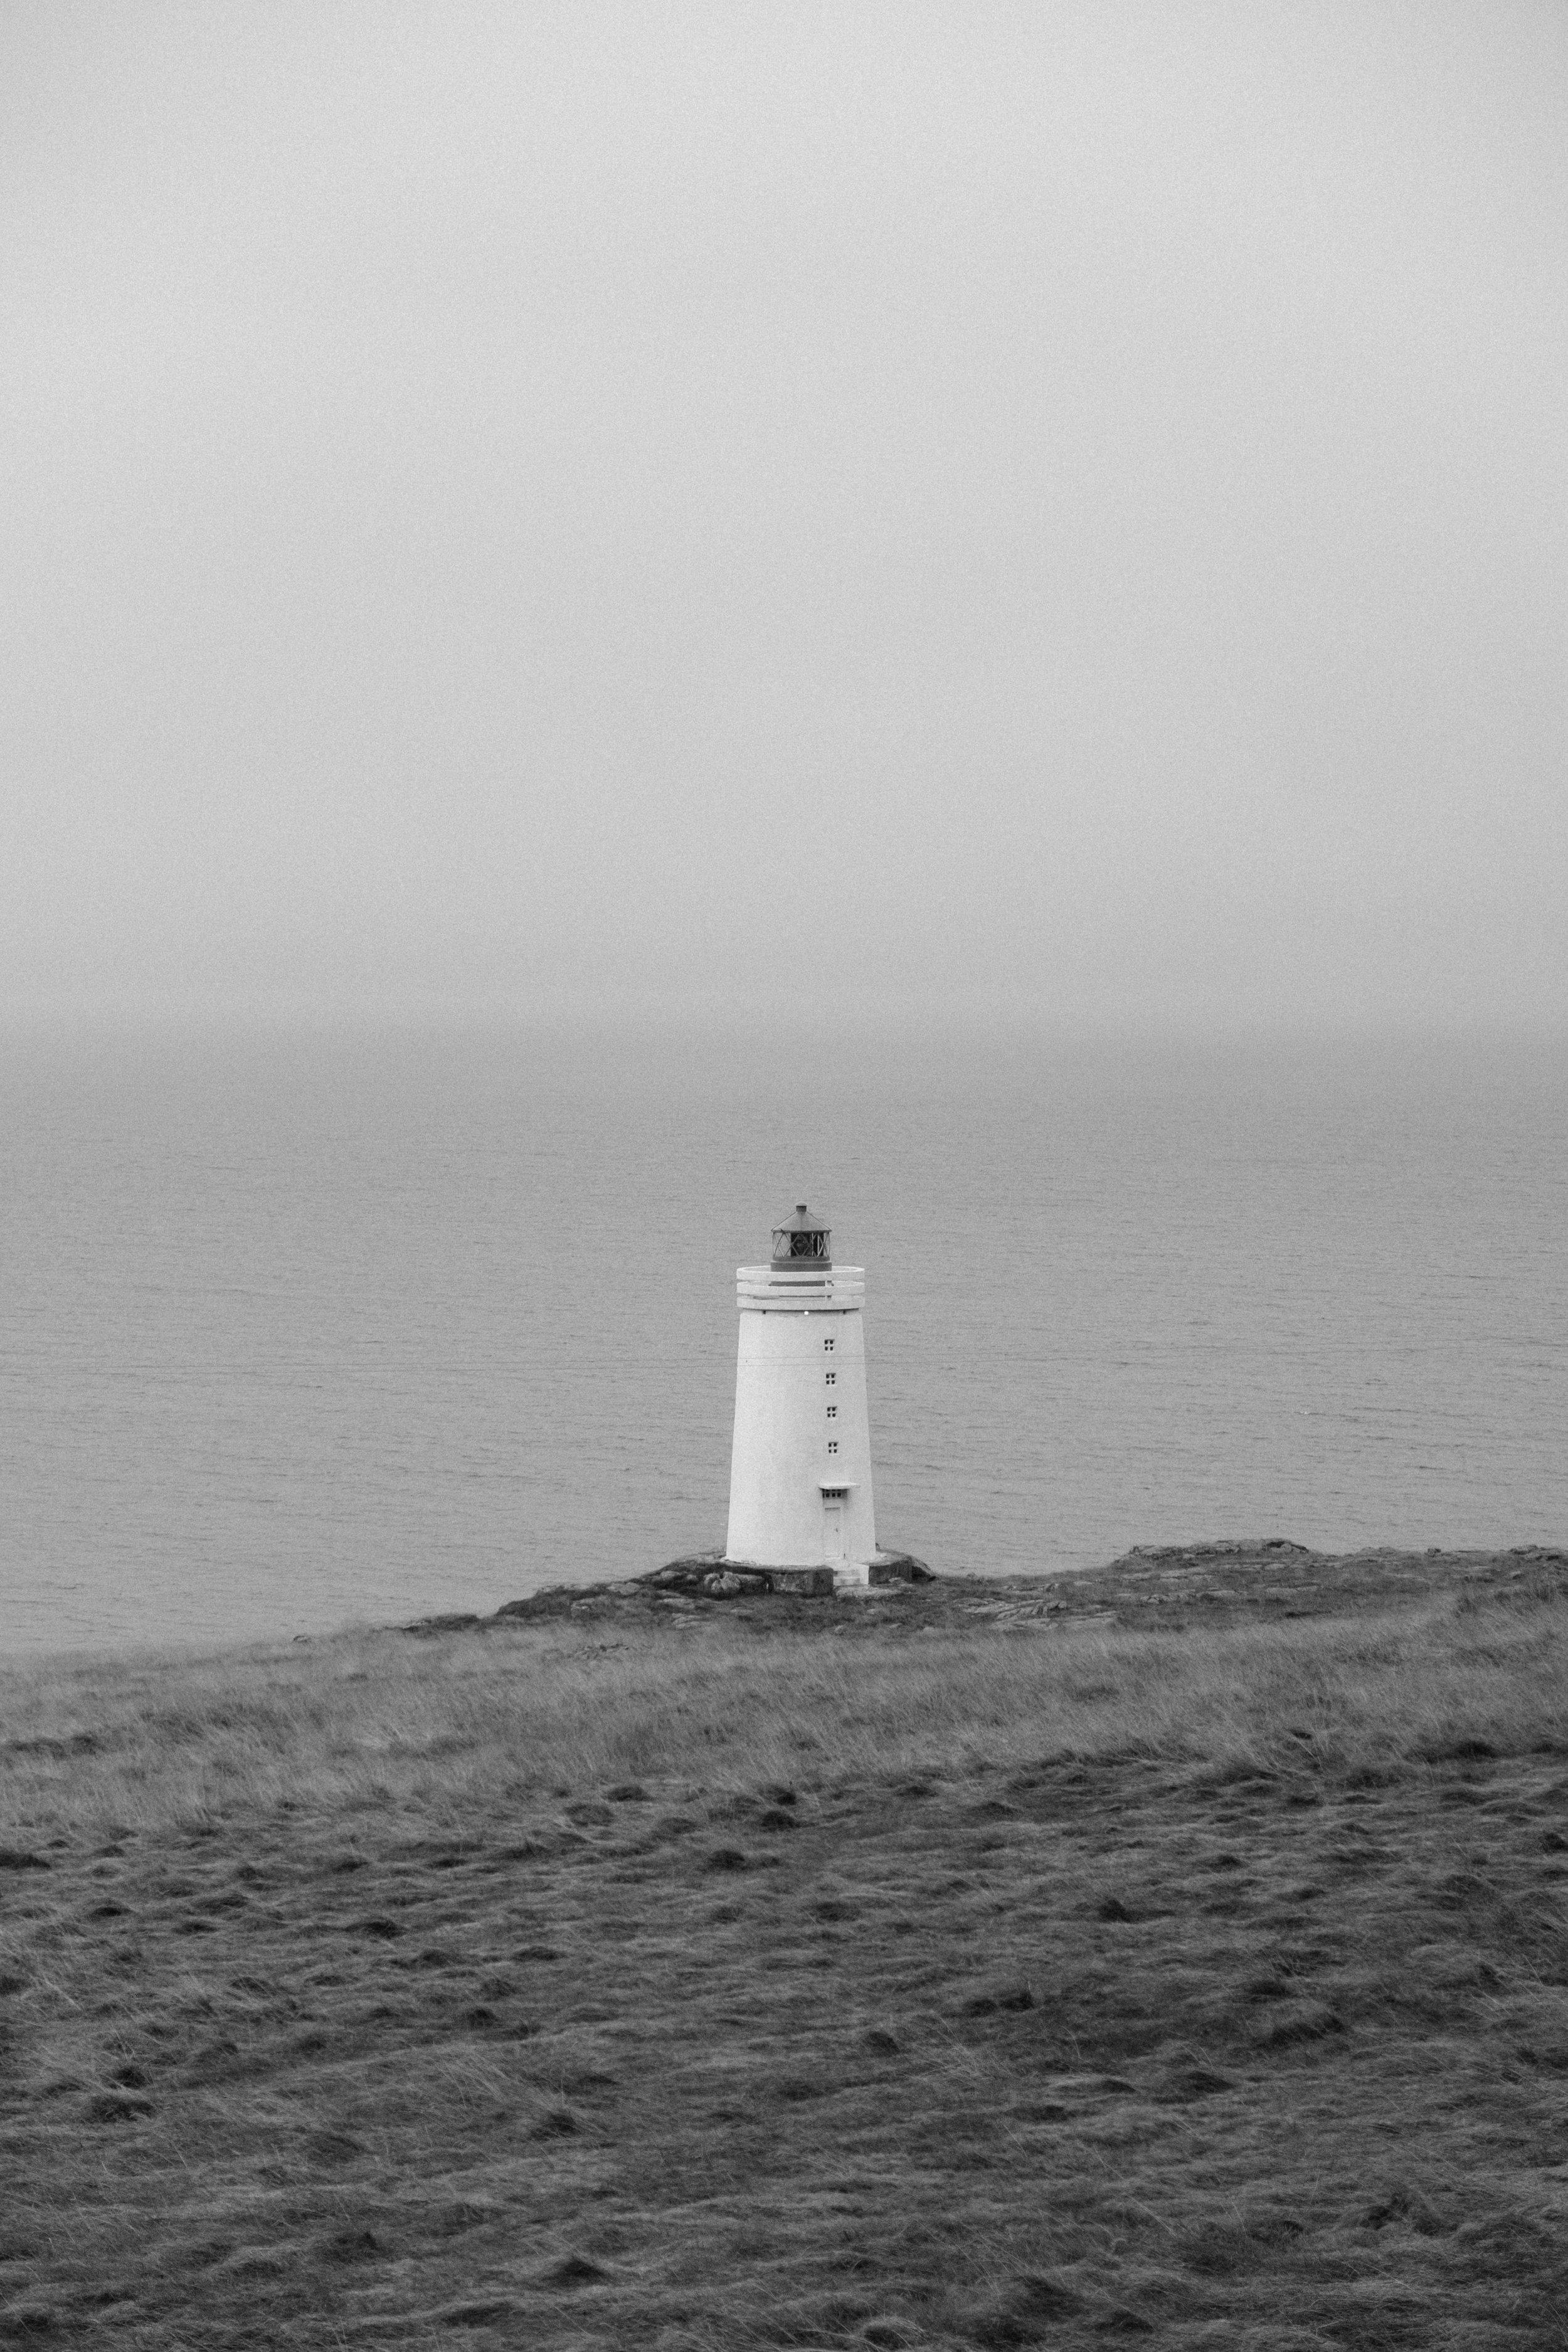 Northern-Iceland-5.jpg